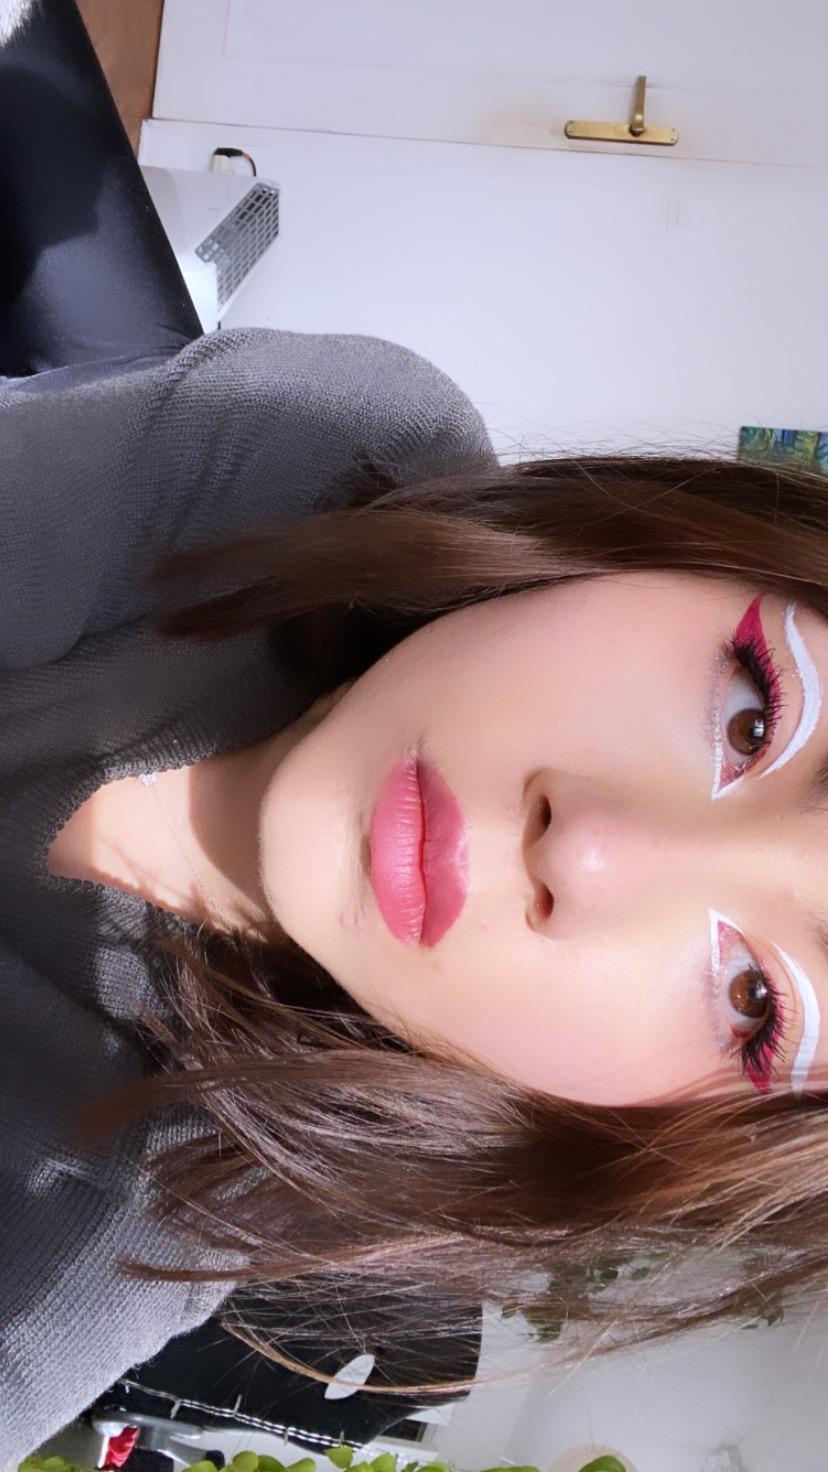 Galerie du maquillage 97c7bd10